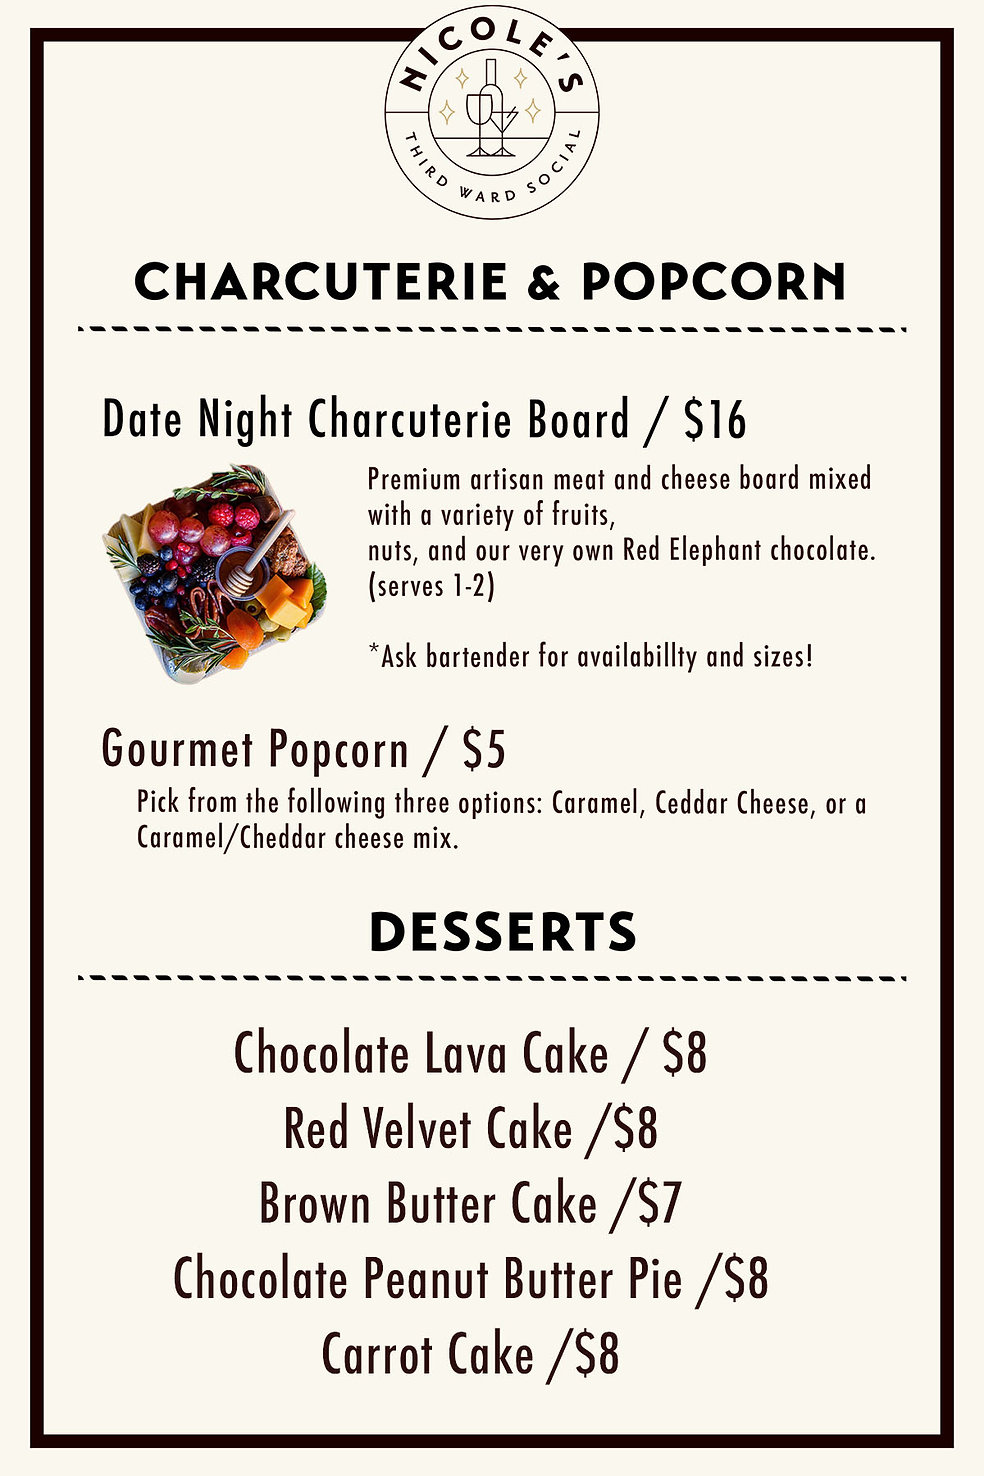 Charcuterie, popcorn, desserts Sept 11.jpg